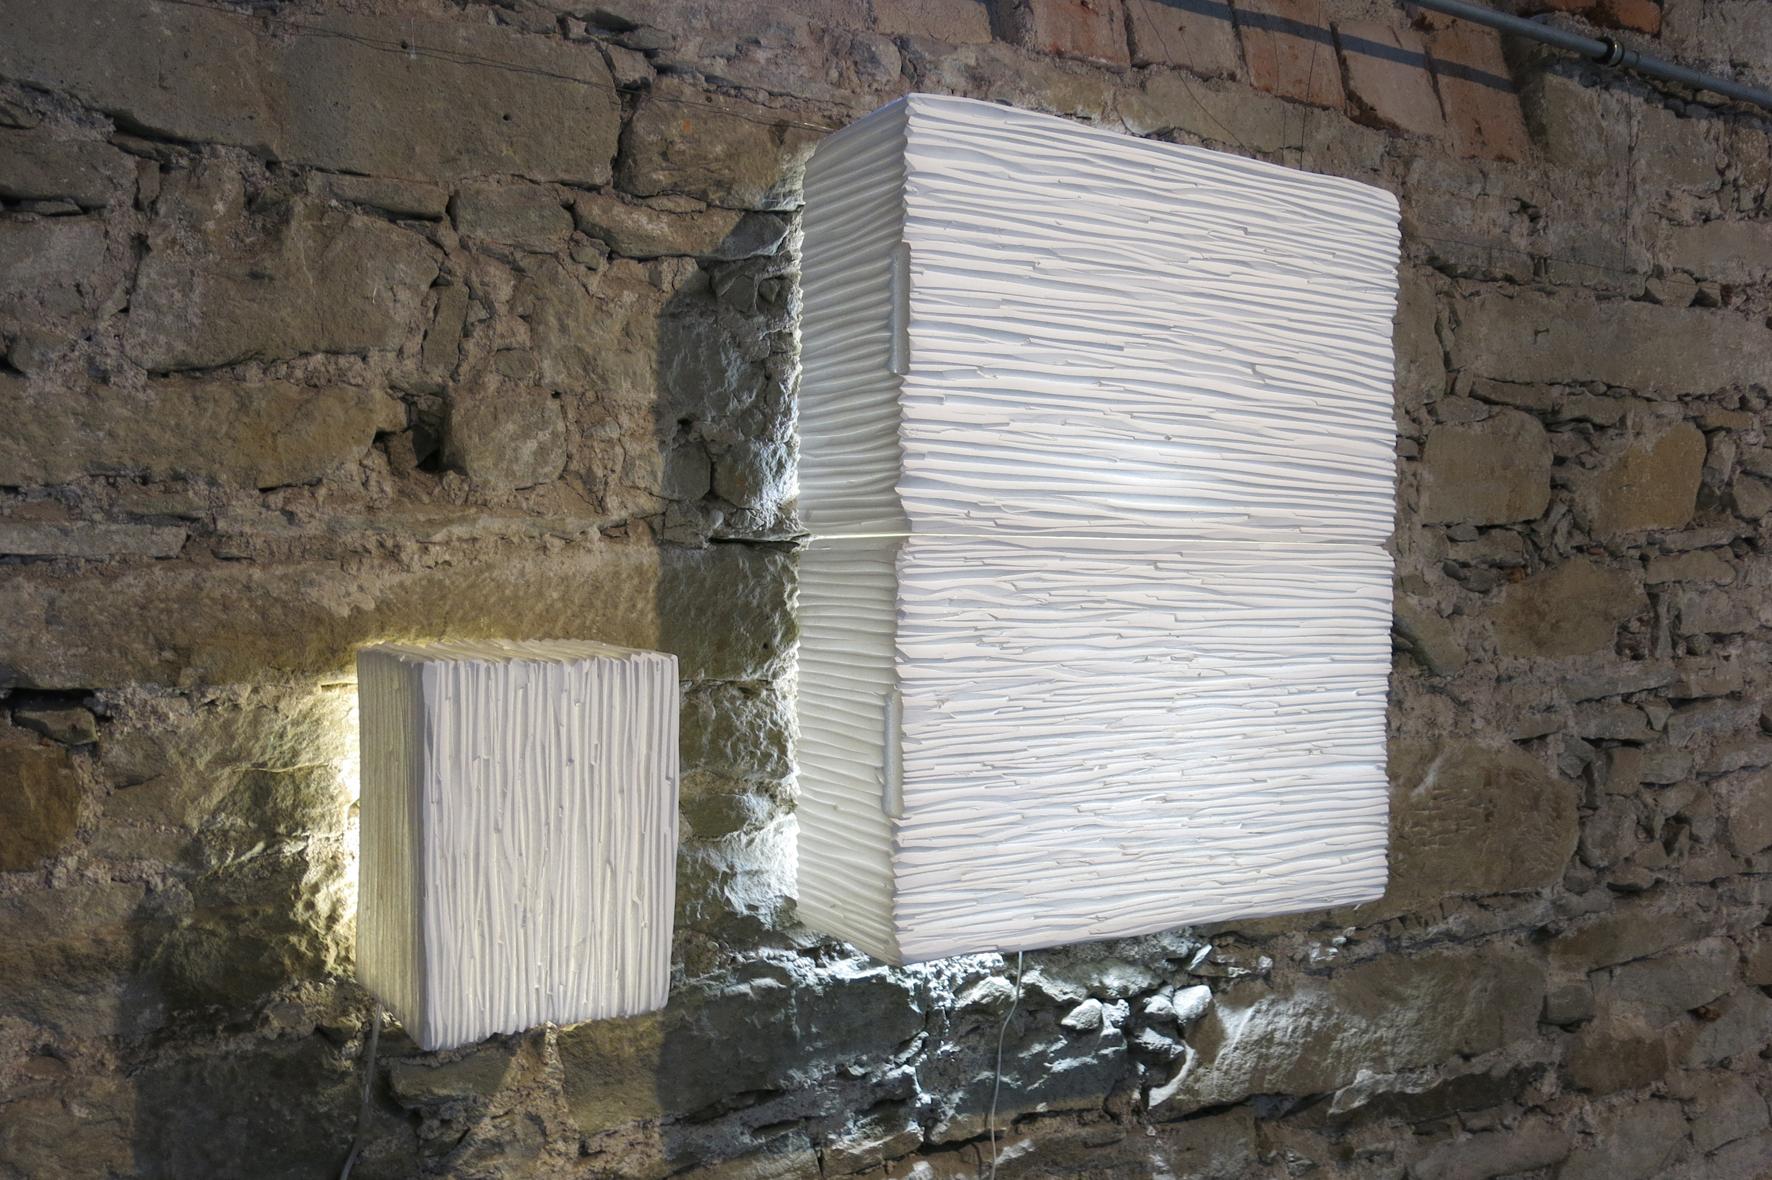 web222-wall-panel-lamp-fixture-MarionFriedmannGallery_Hipphalle_Gmunden_Gisela_Stiegler_photo_MFGallery_LR.jpg